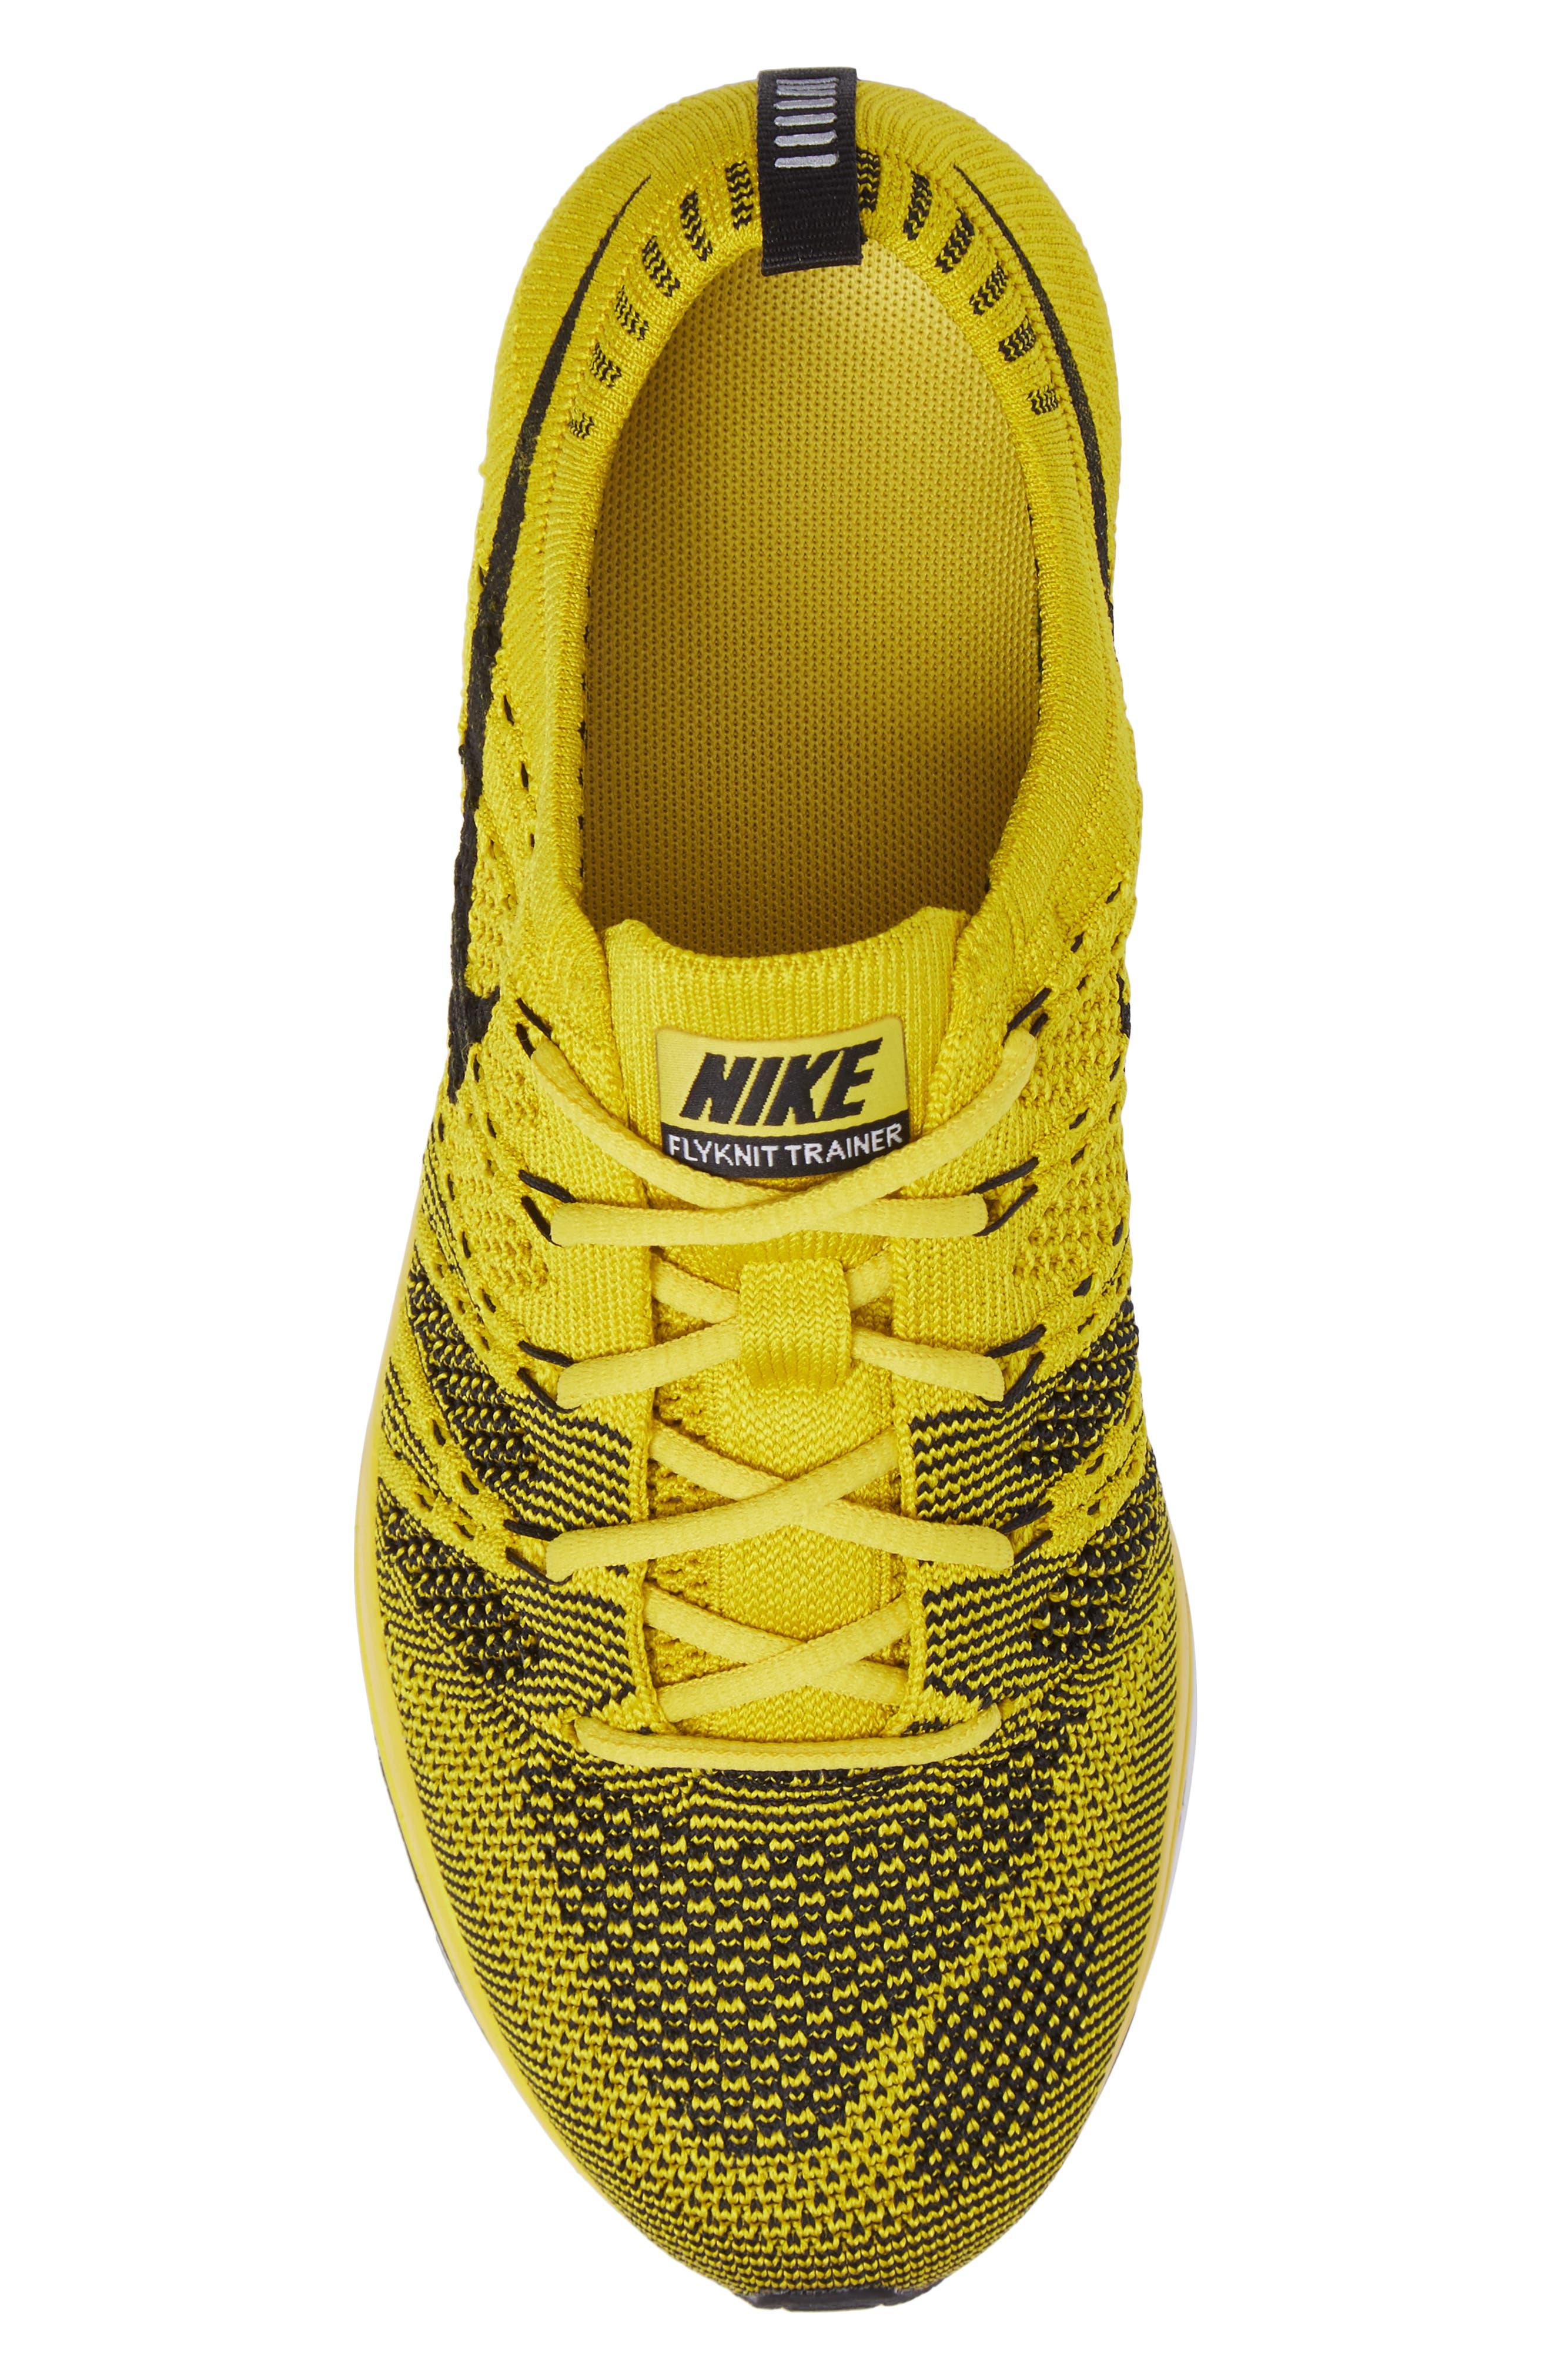 NikeLab Flyknit Trainer Sneaker,                             Alternate thumbnail 6, color,                             Bright Citron/ Black/ White